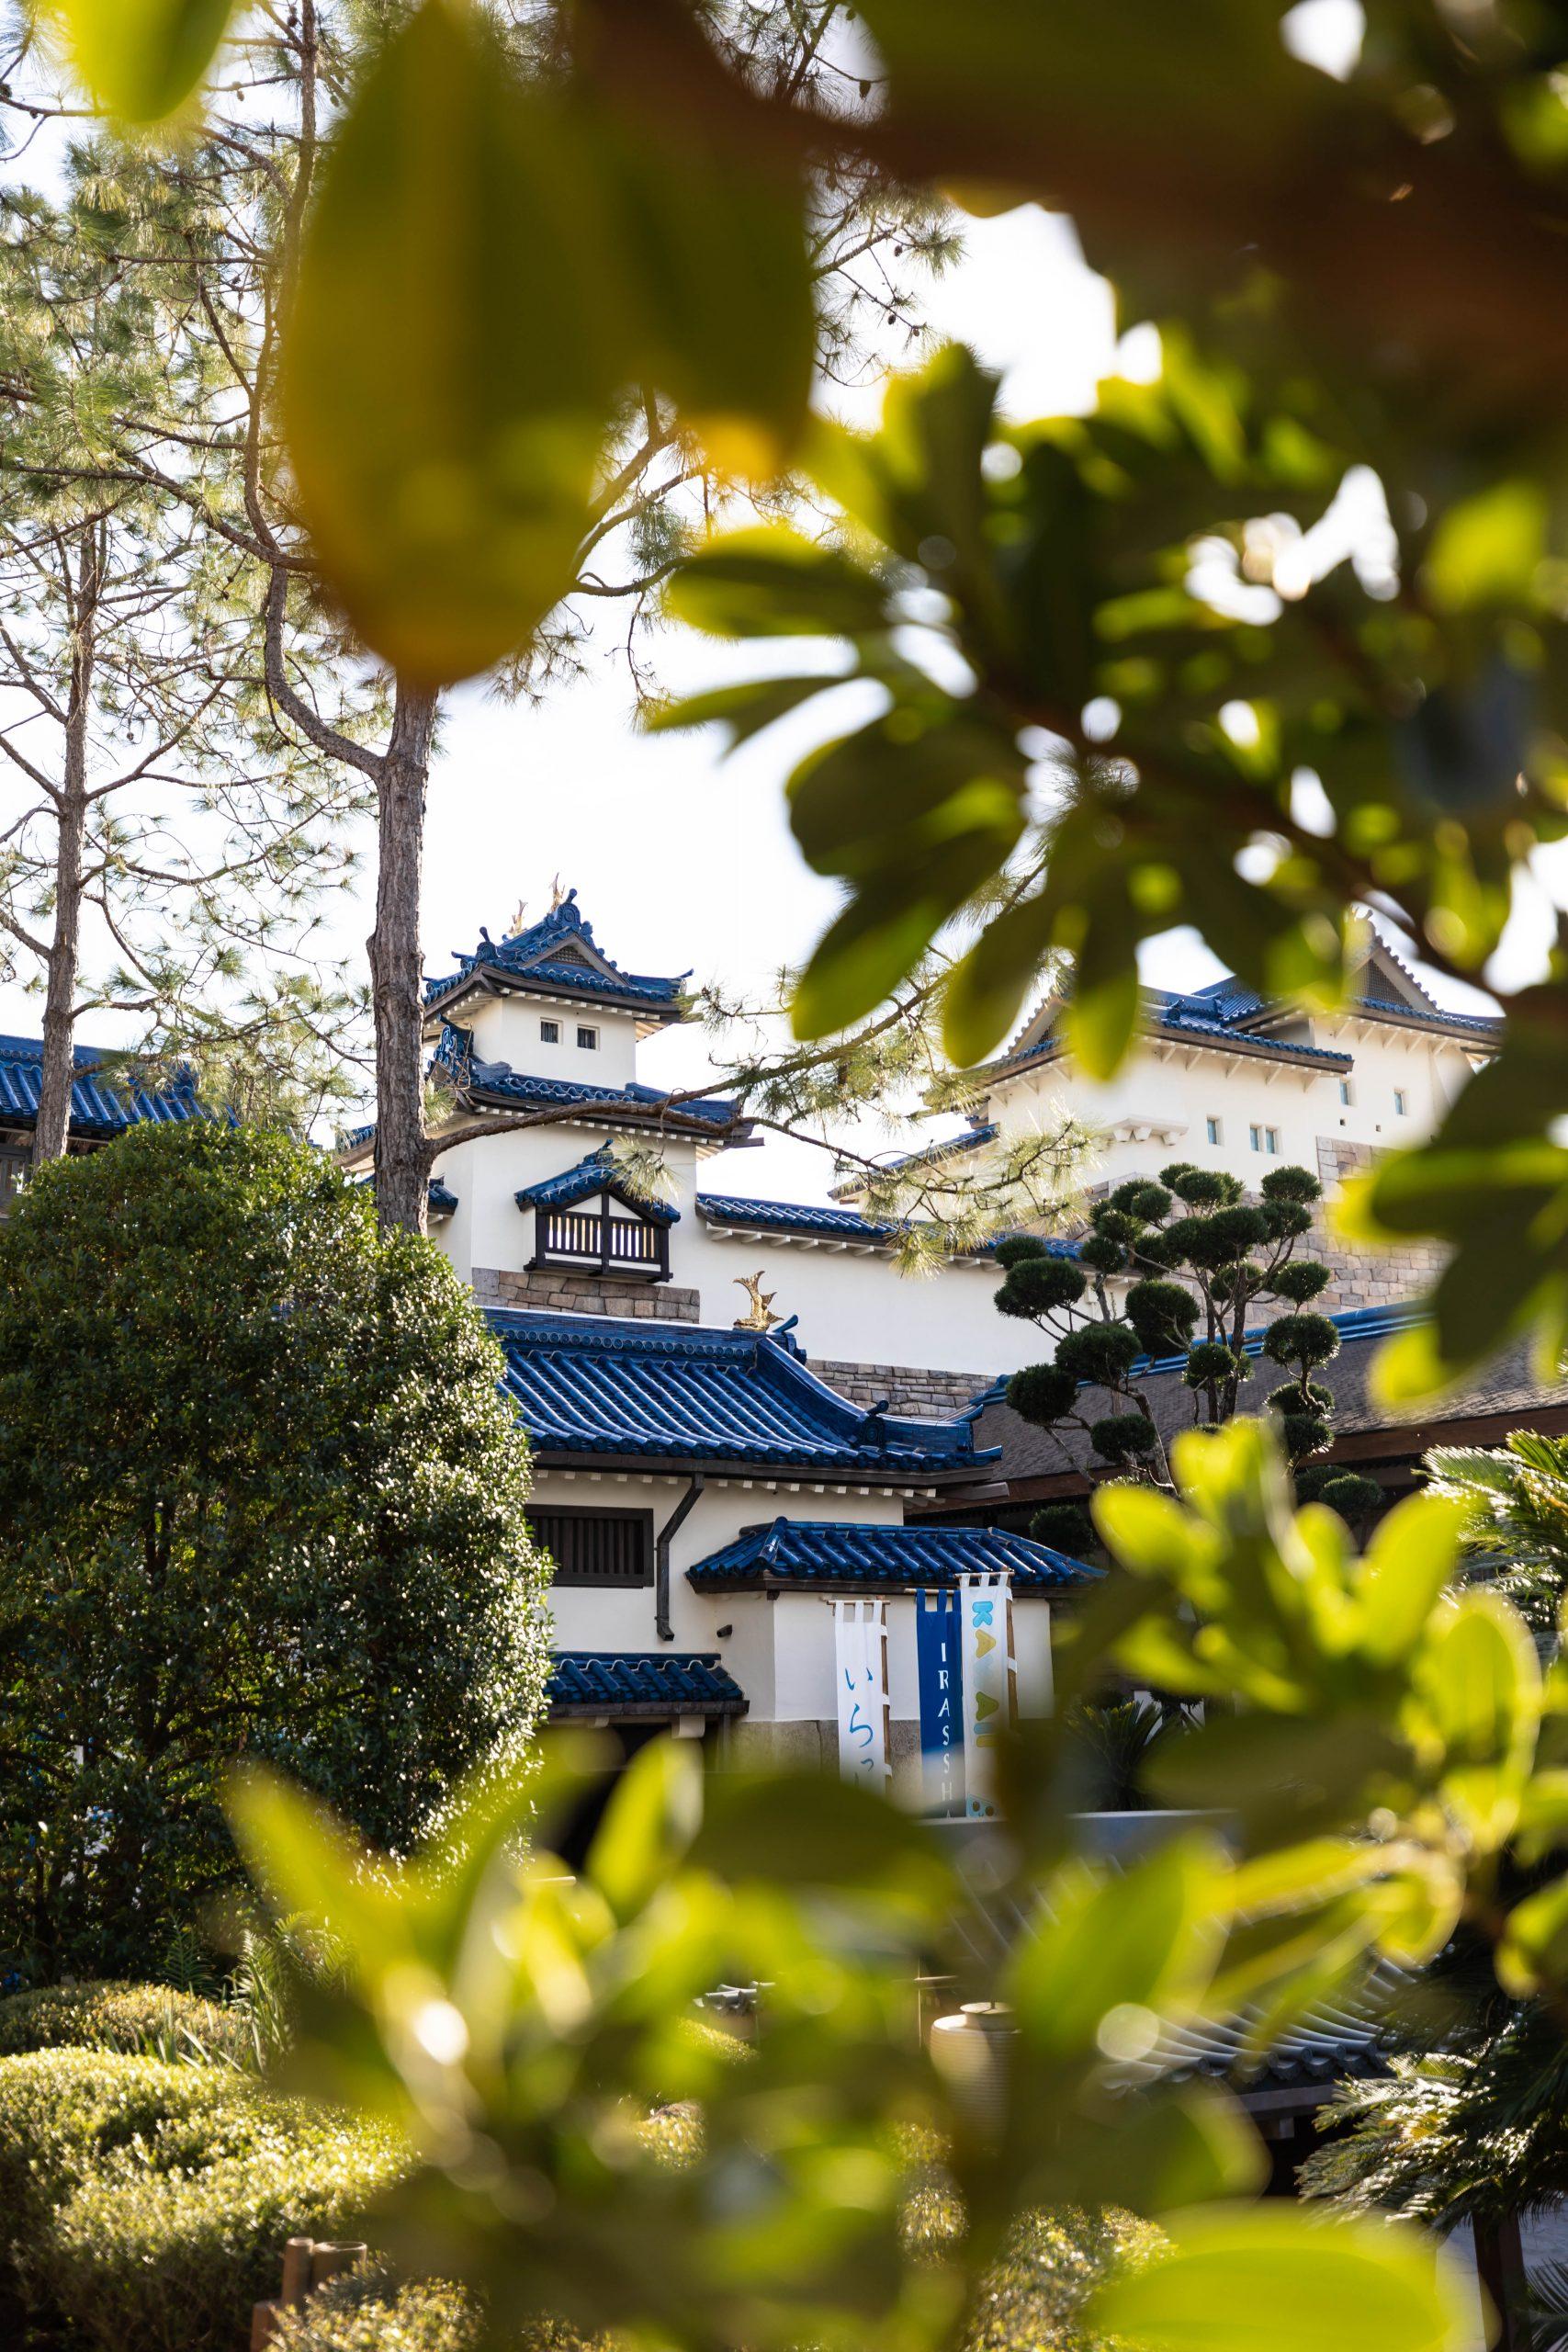 White Heron Castle Gate Japan Epcot Walt Disney World by Luxury Travel Writer and Photographer Annie Fairfax